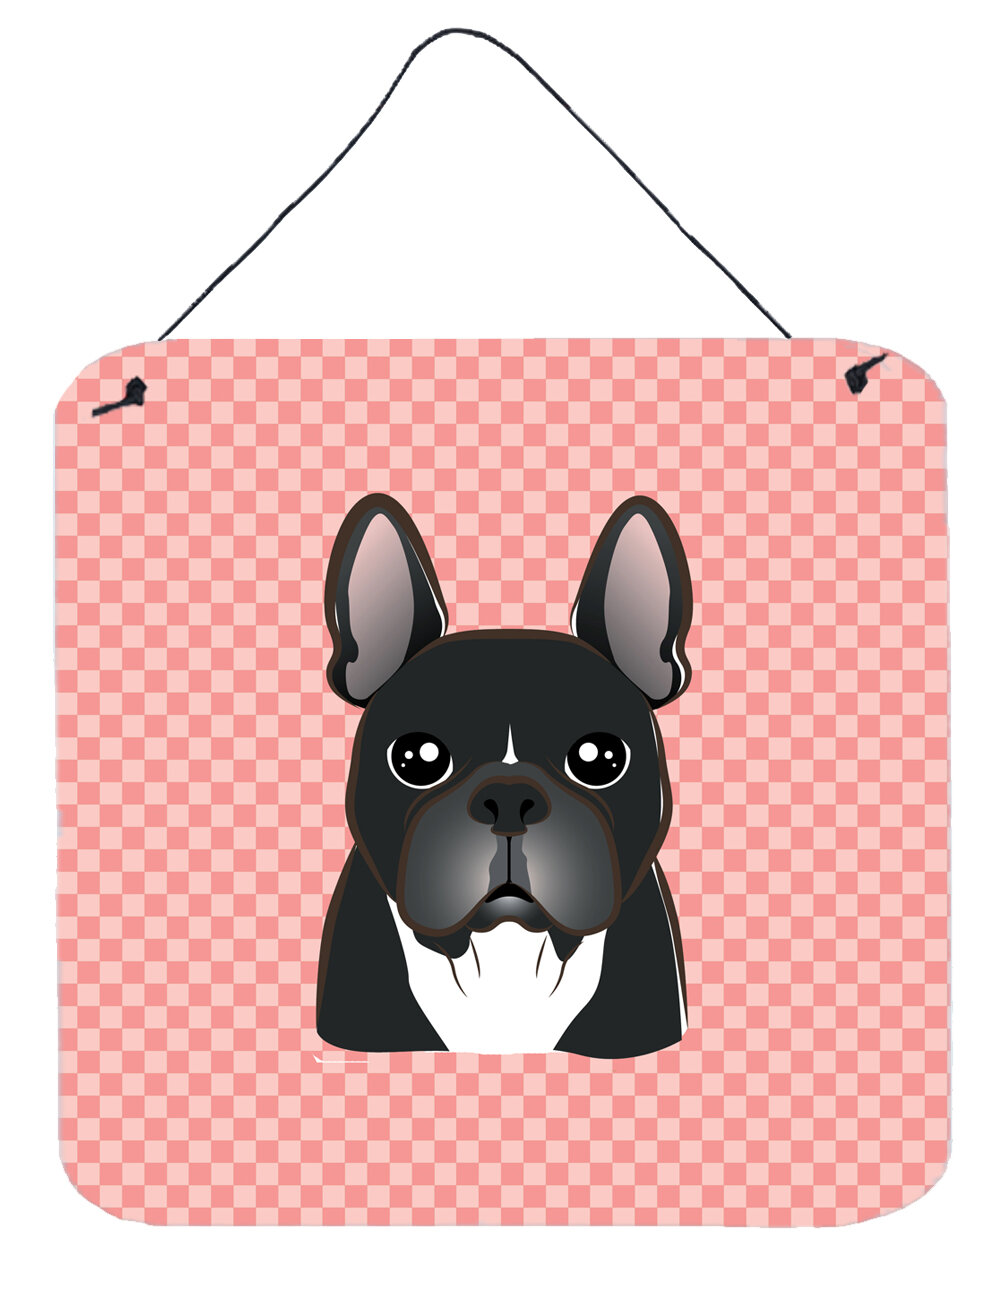 caroline s treasures checkerboard french bulldog by denny knight